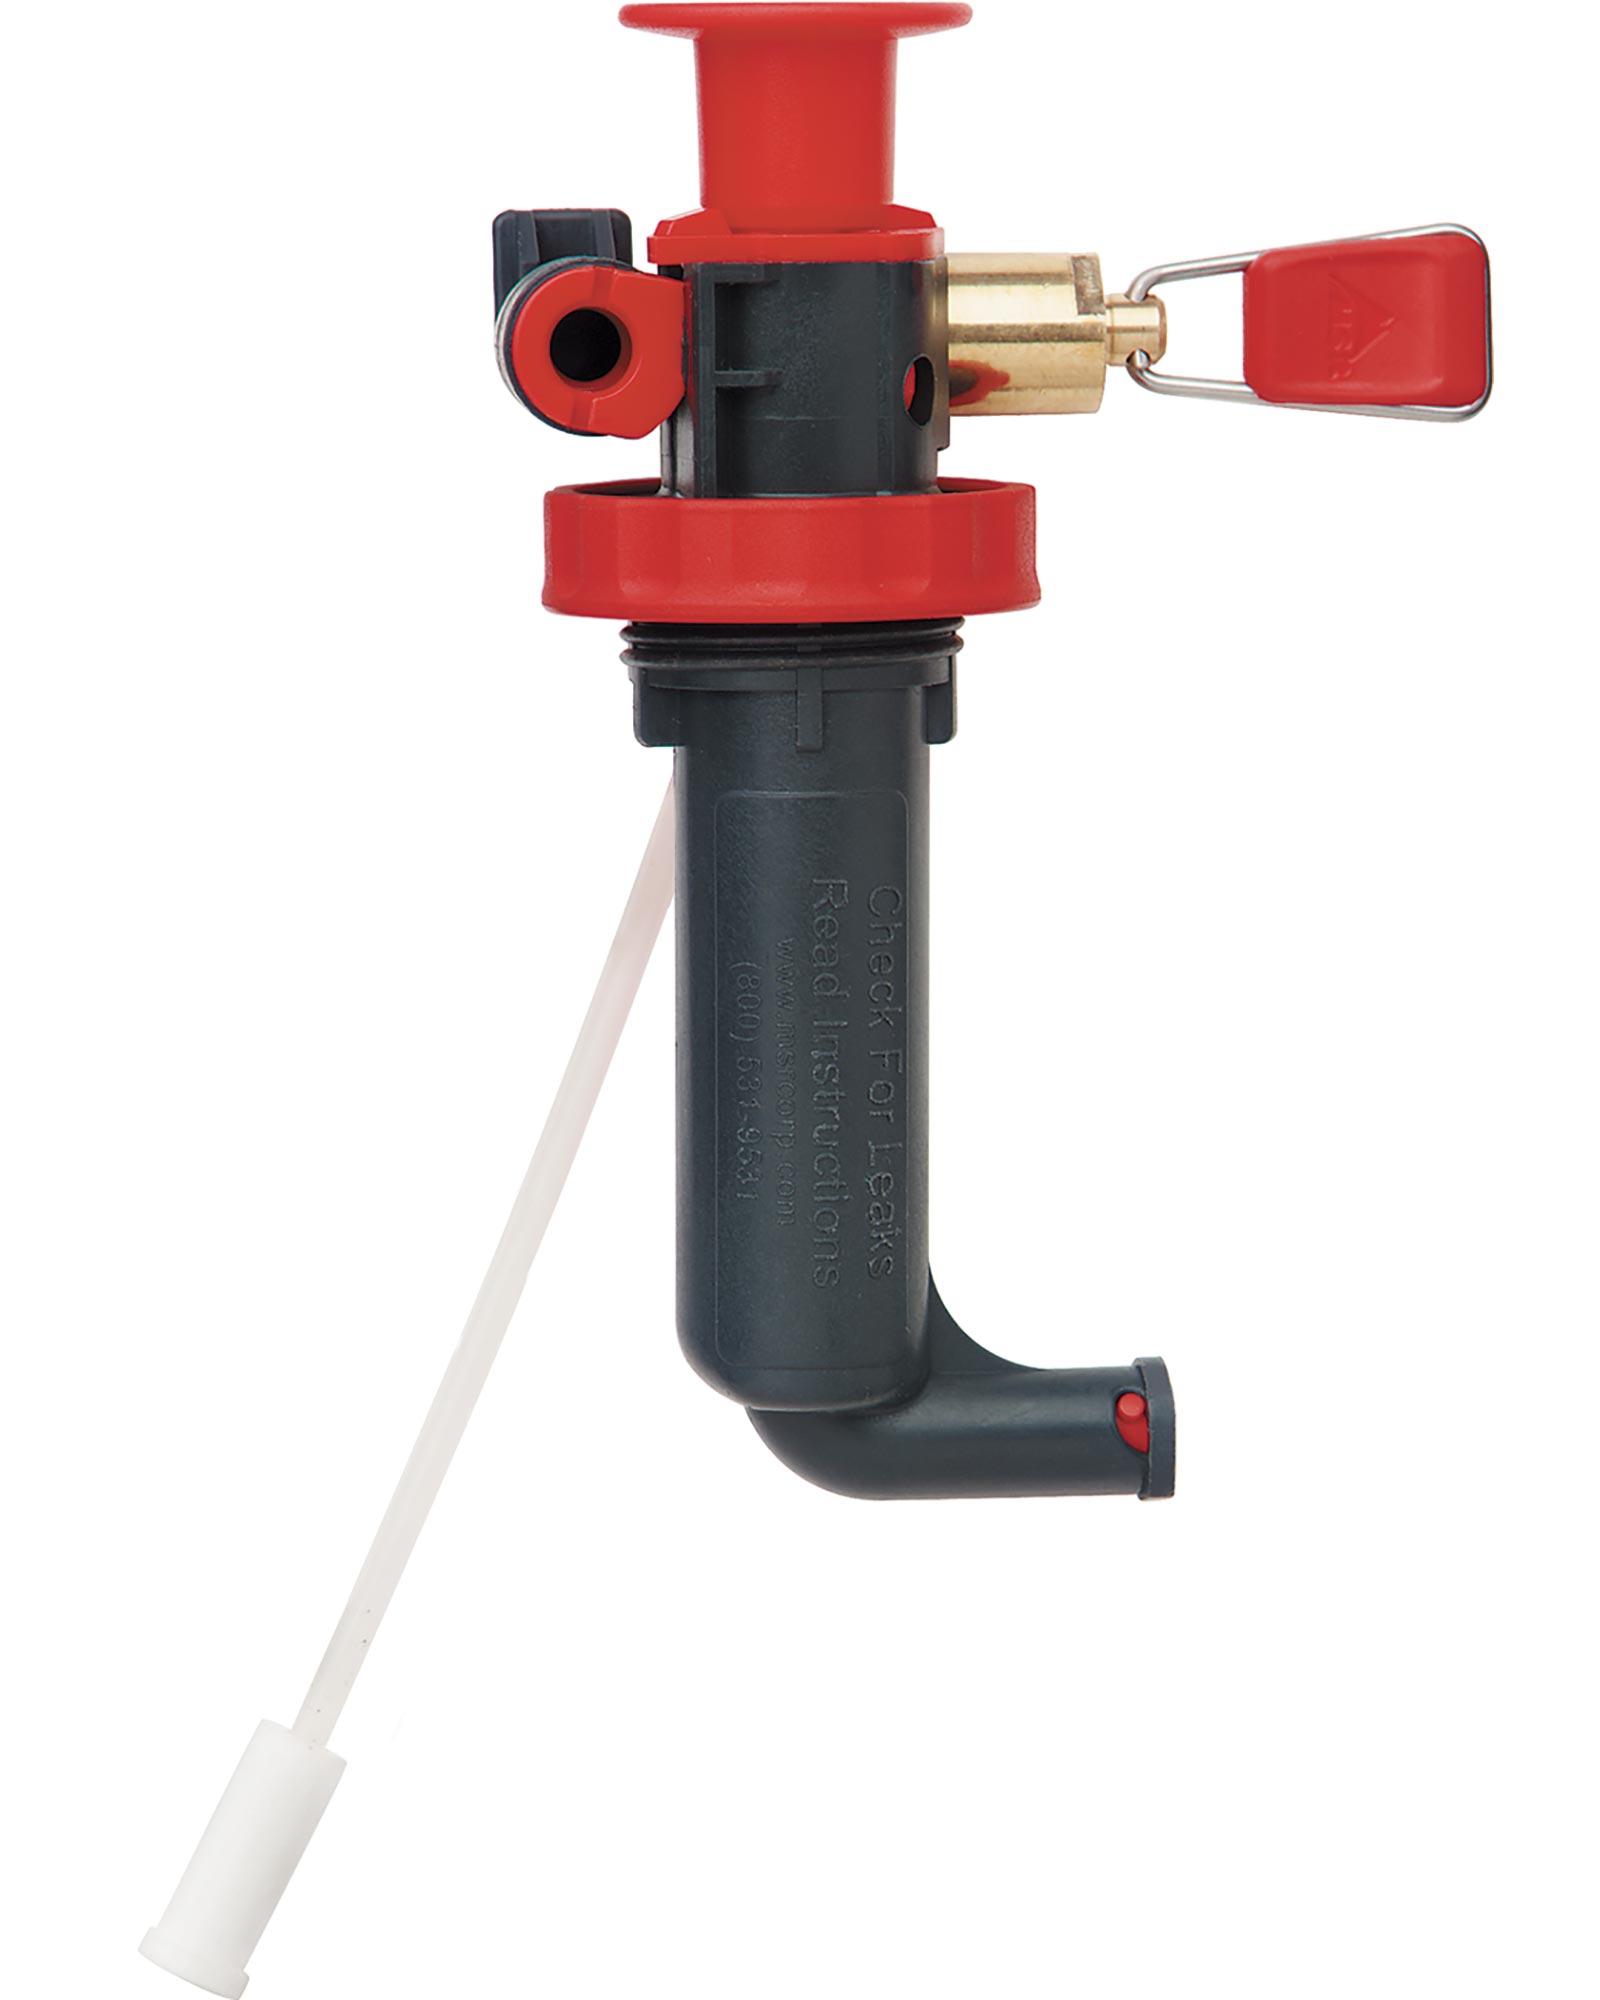 Msr 20oz/590ml Msr Fuel Bottle